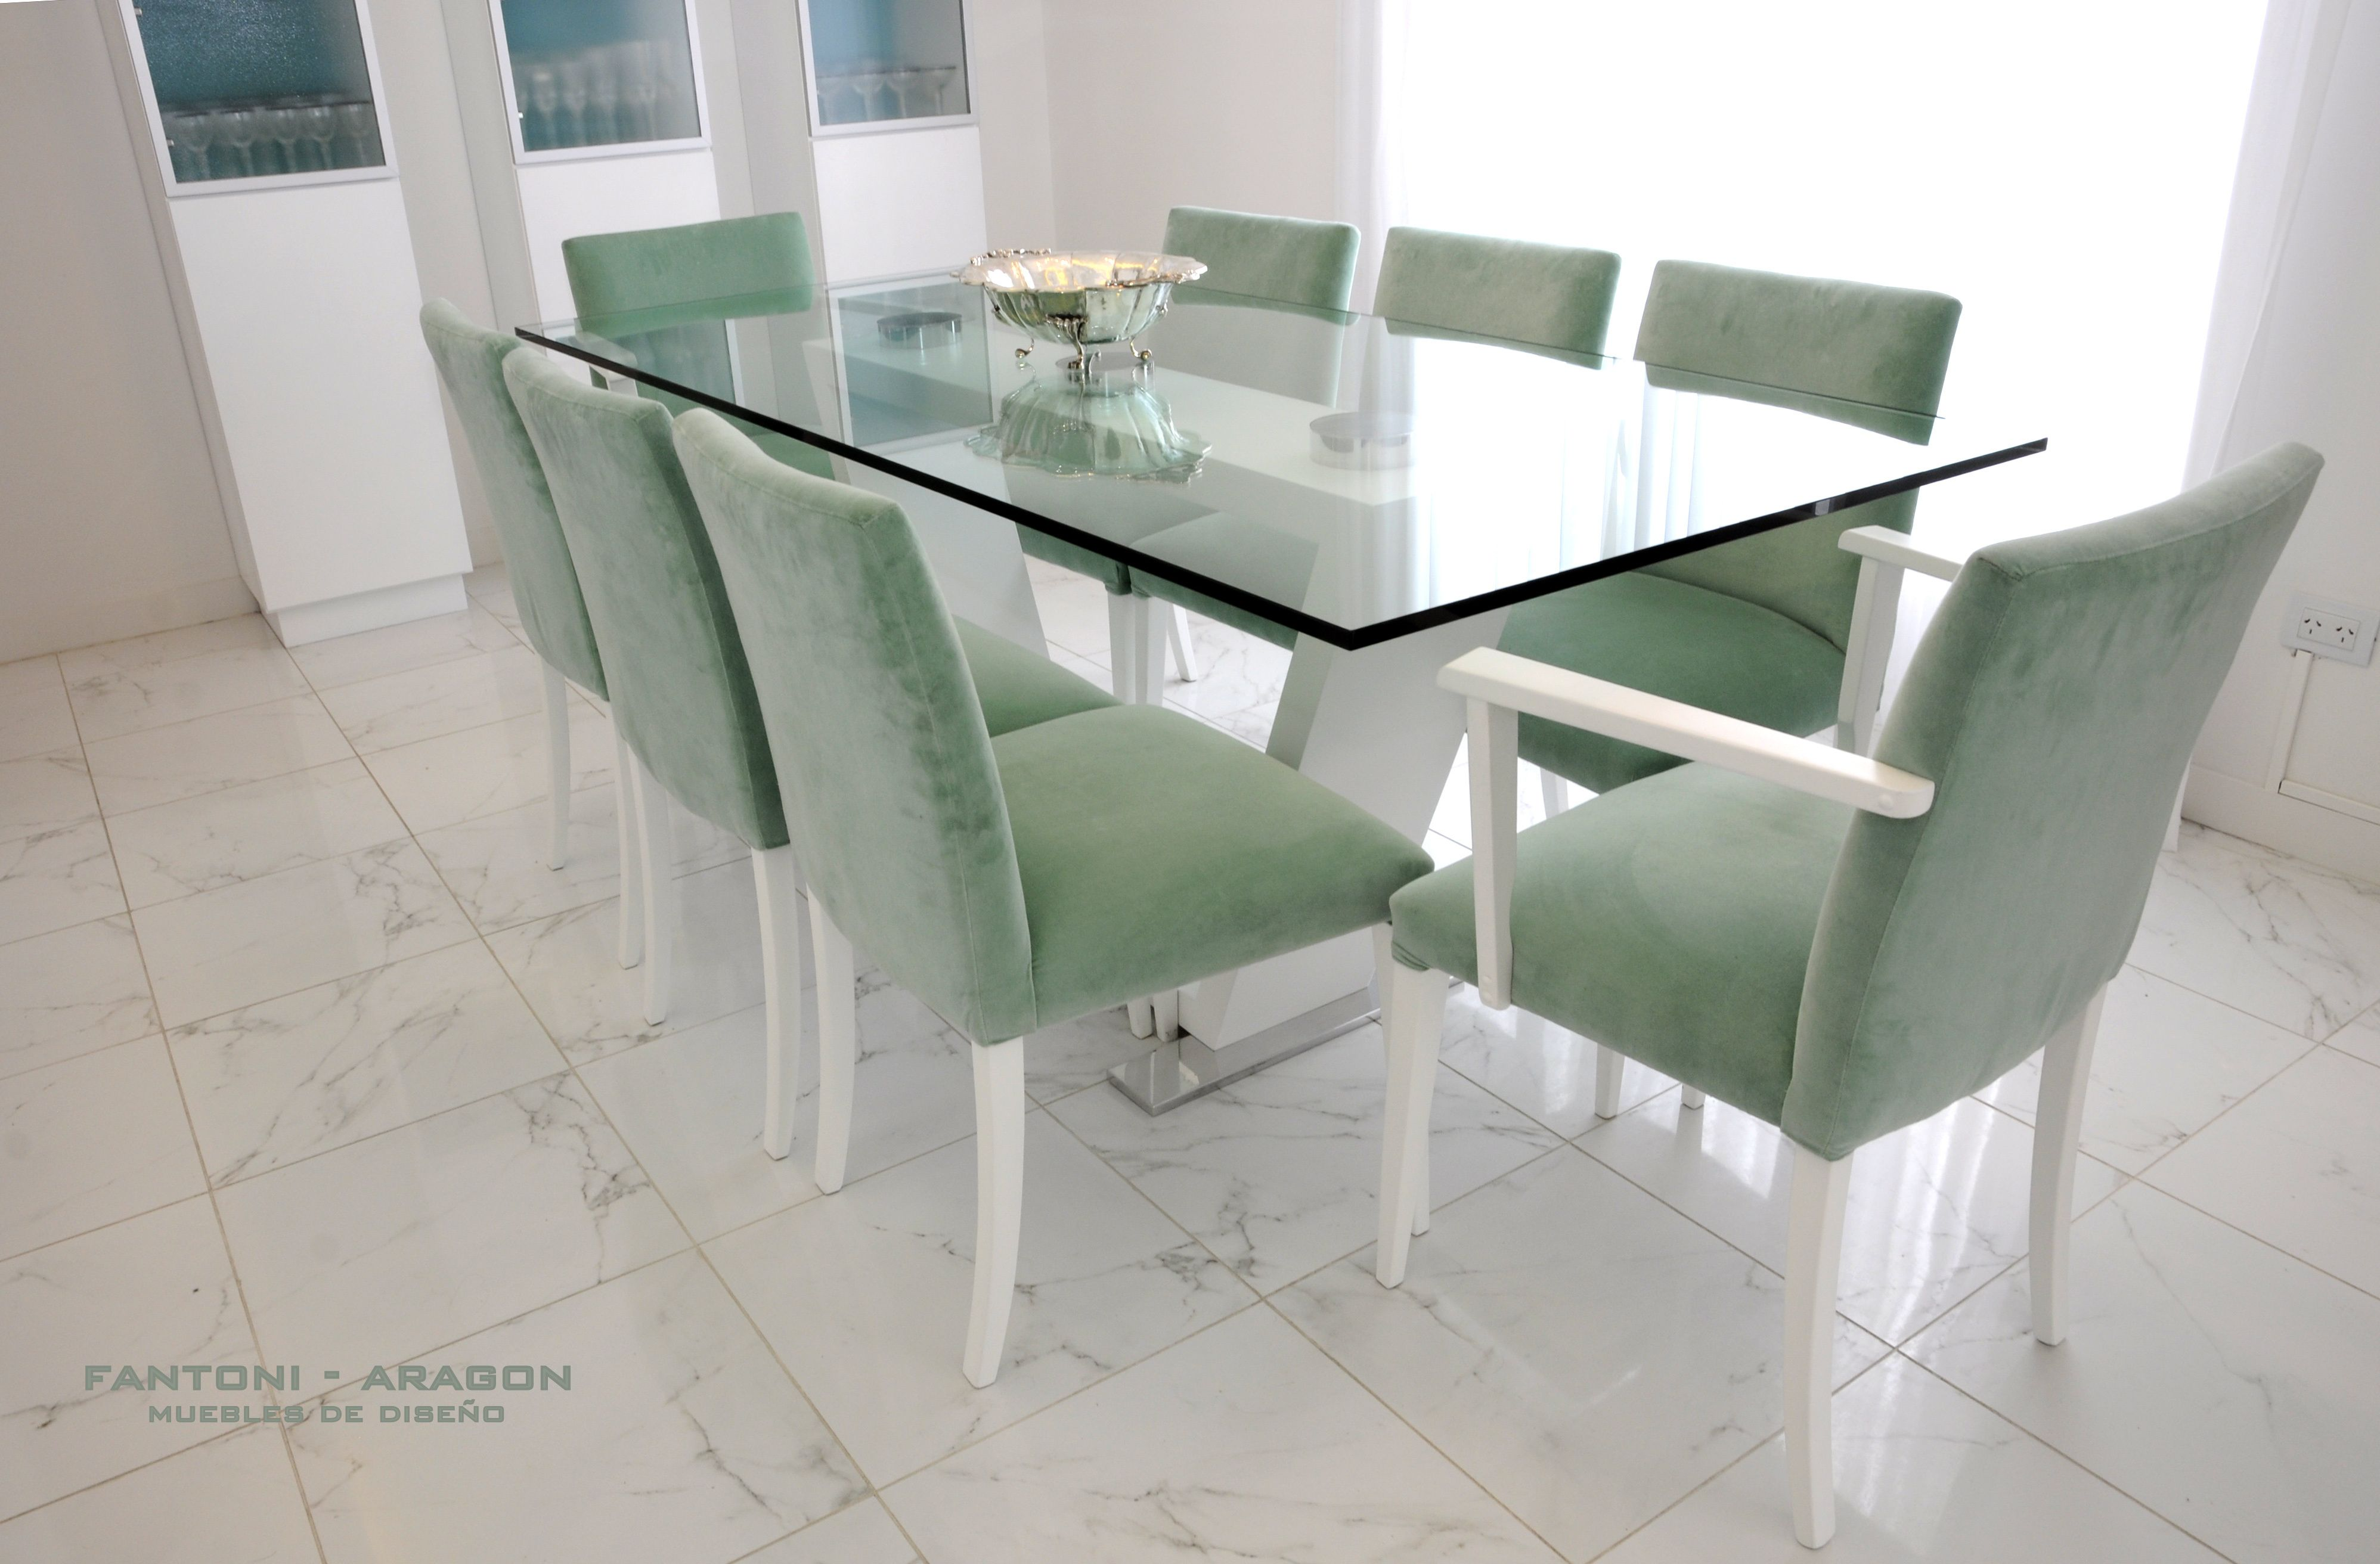 Fantoni Aragon Muebles De Dise O Interior Cocinas Pinterest  # Muebles Fantoni